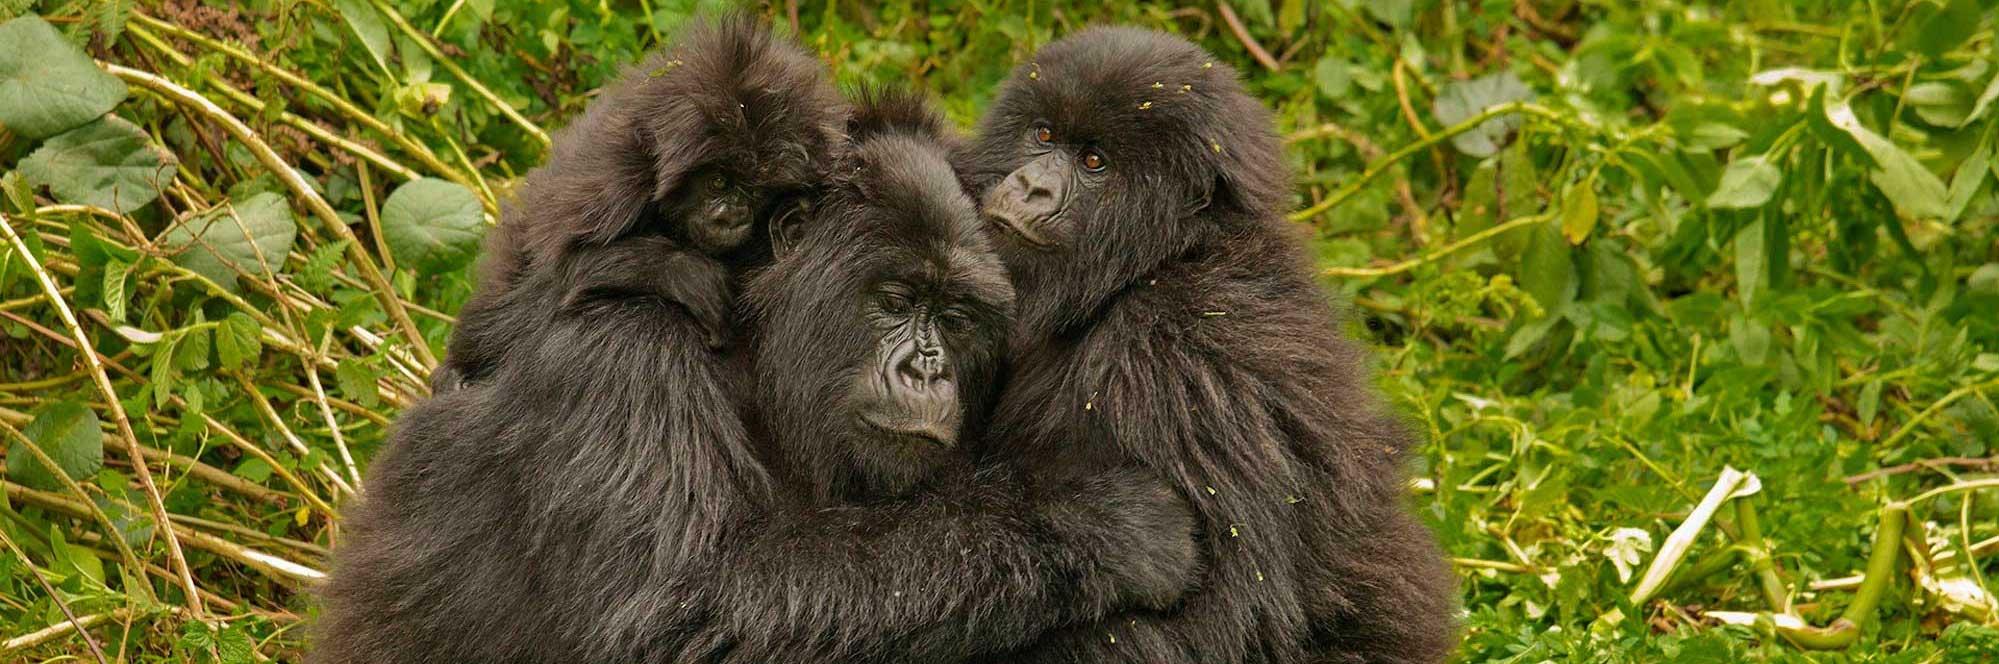 gorillas-jp_fotor_fotor